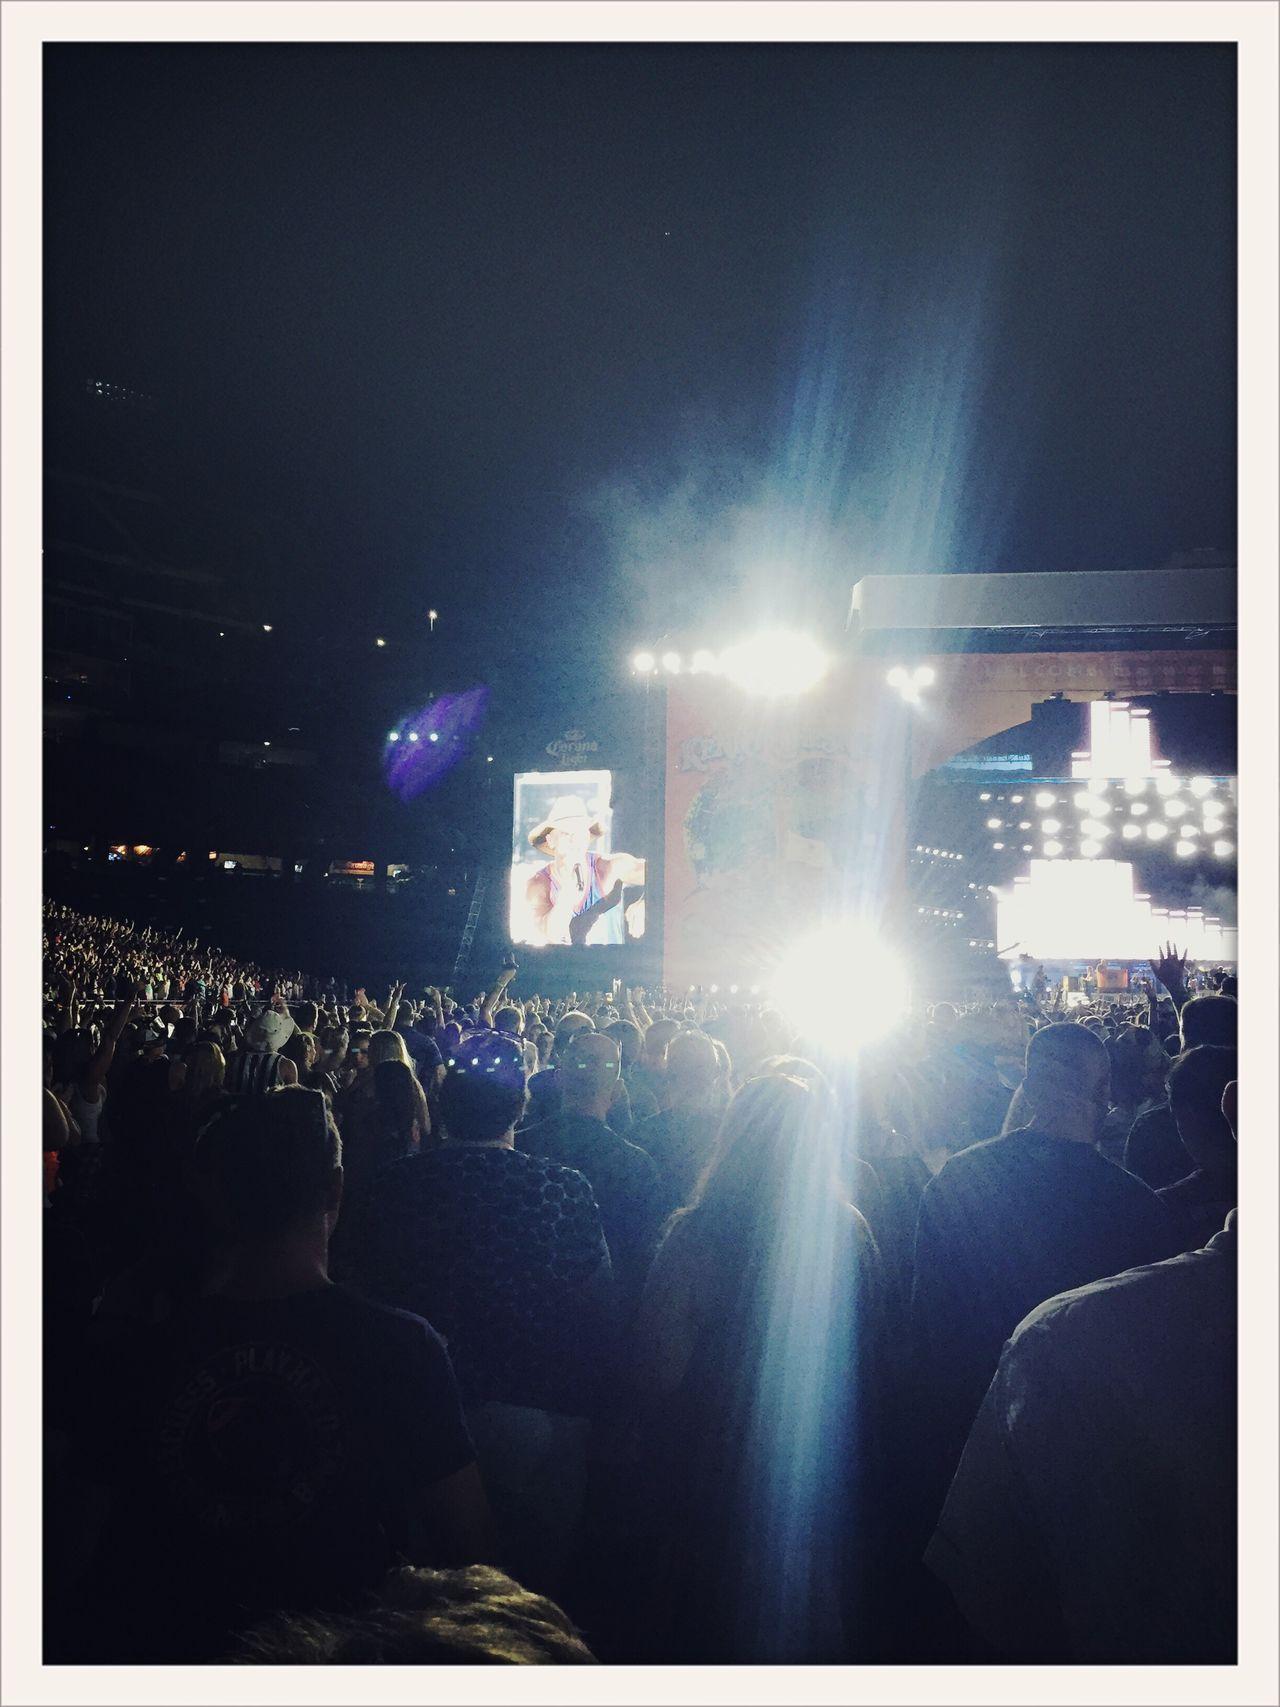 Country Fest: Kenney Chesney Best Of EyeEm NEM Mood Summer2016 Best EyeEm Shot AMPt_community Summer Concerts Kenney Chesney